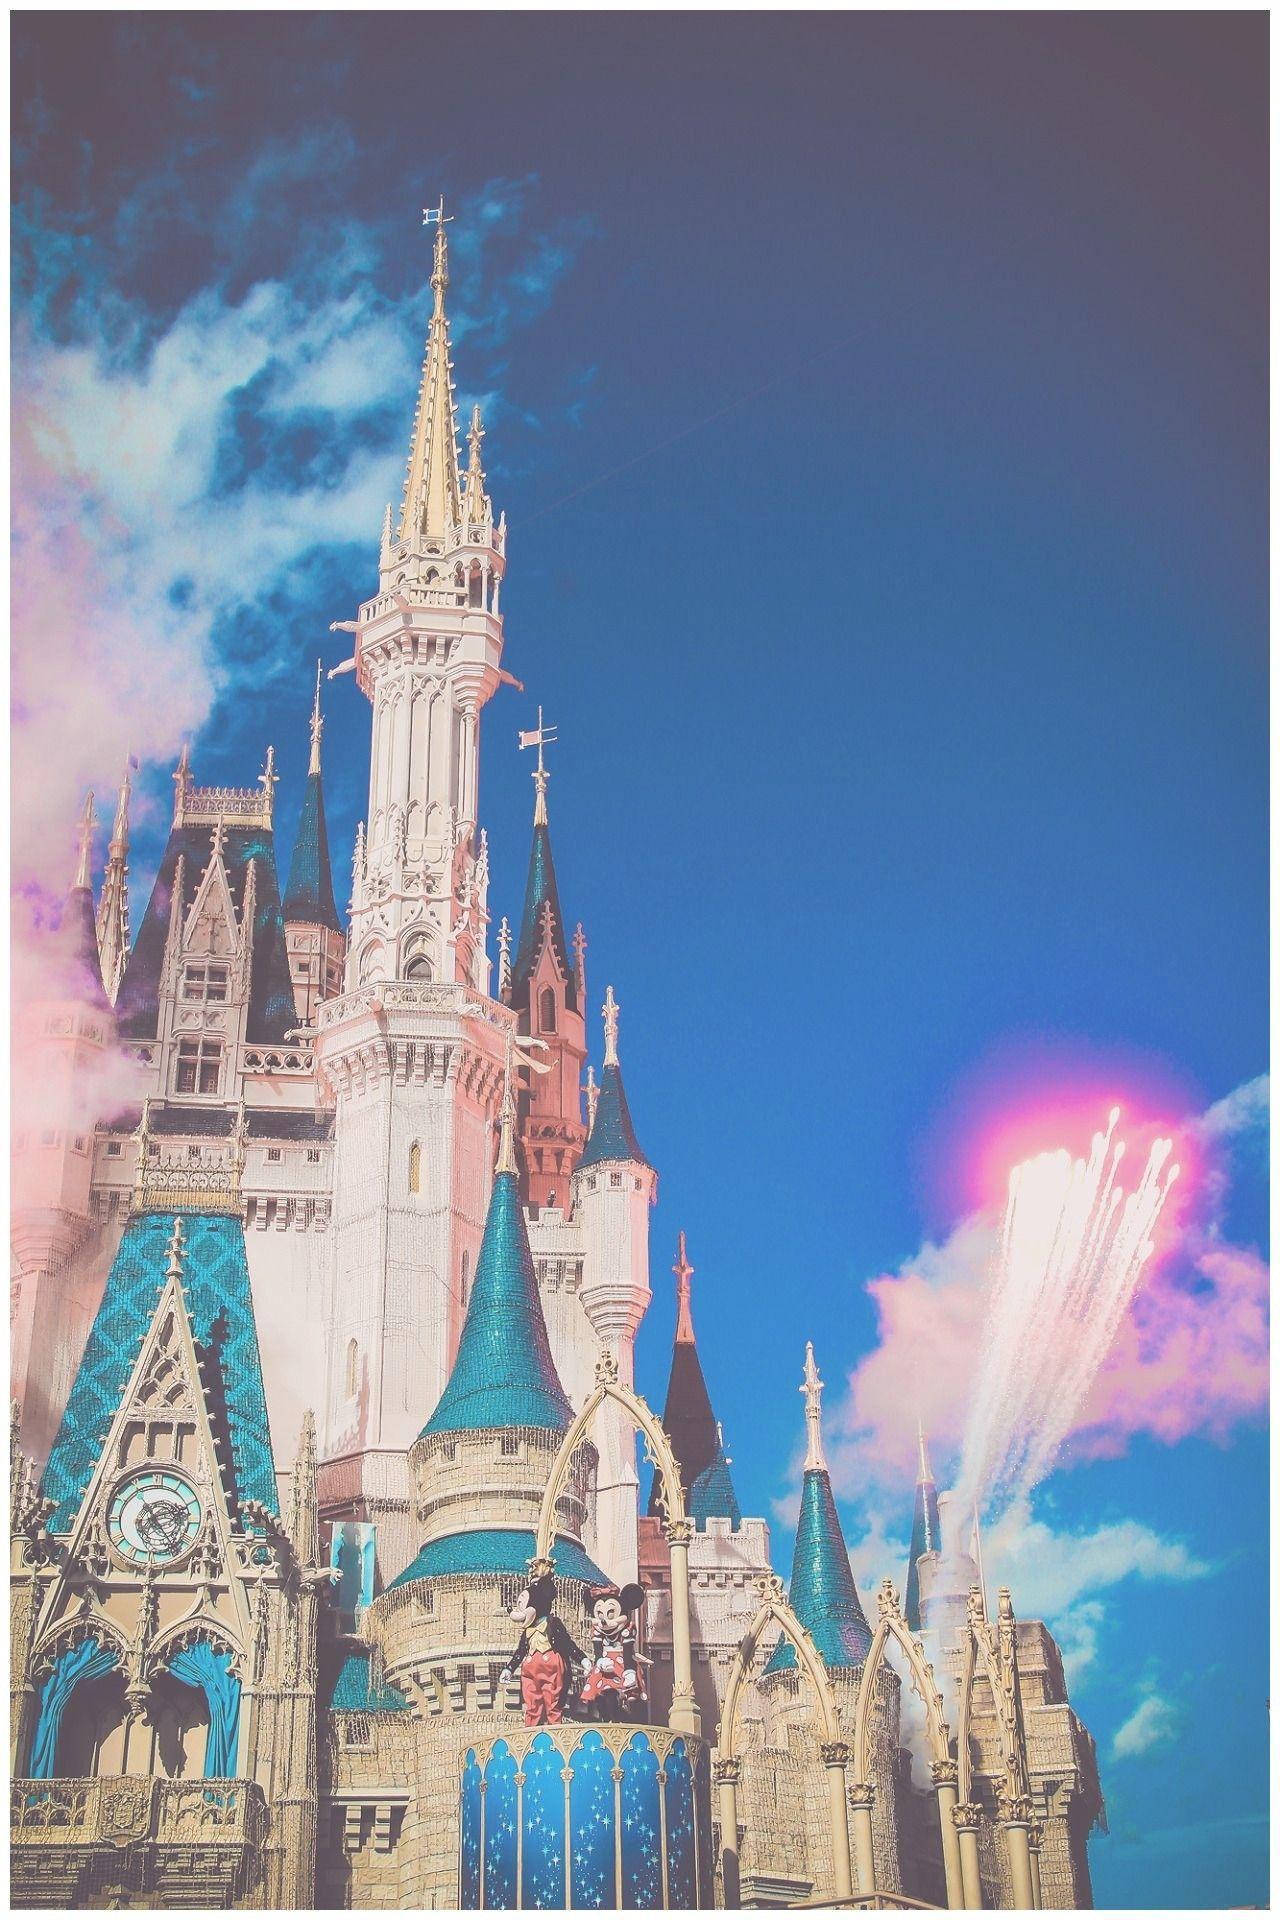 Disney Castle Iphone Wallpapers Top Free Disney Castle Iphone Backgrounds Wallpaperaccess